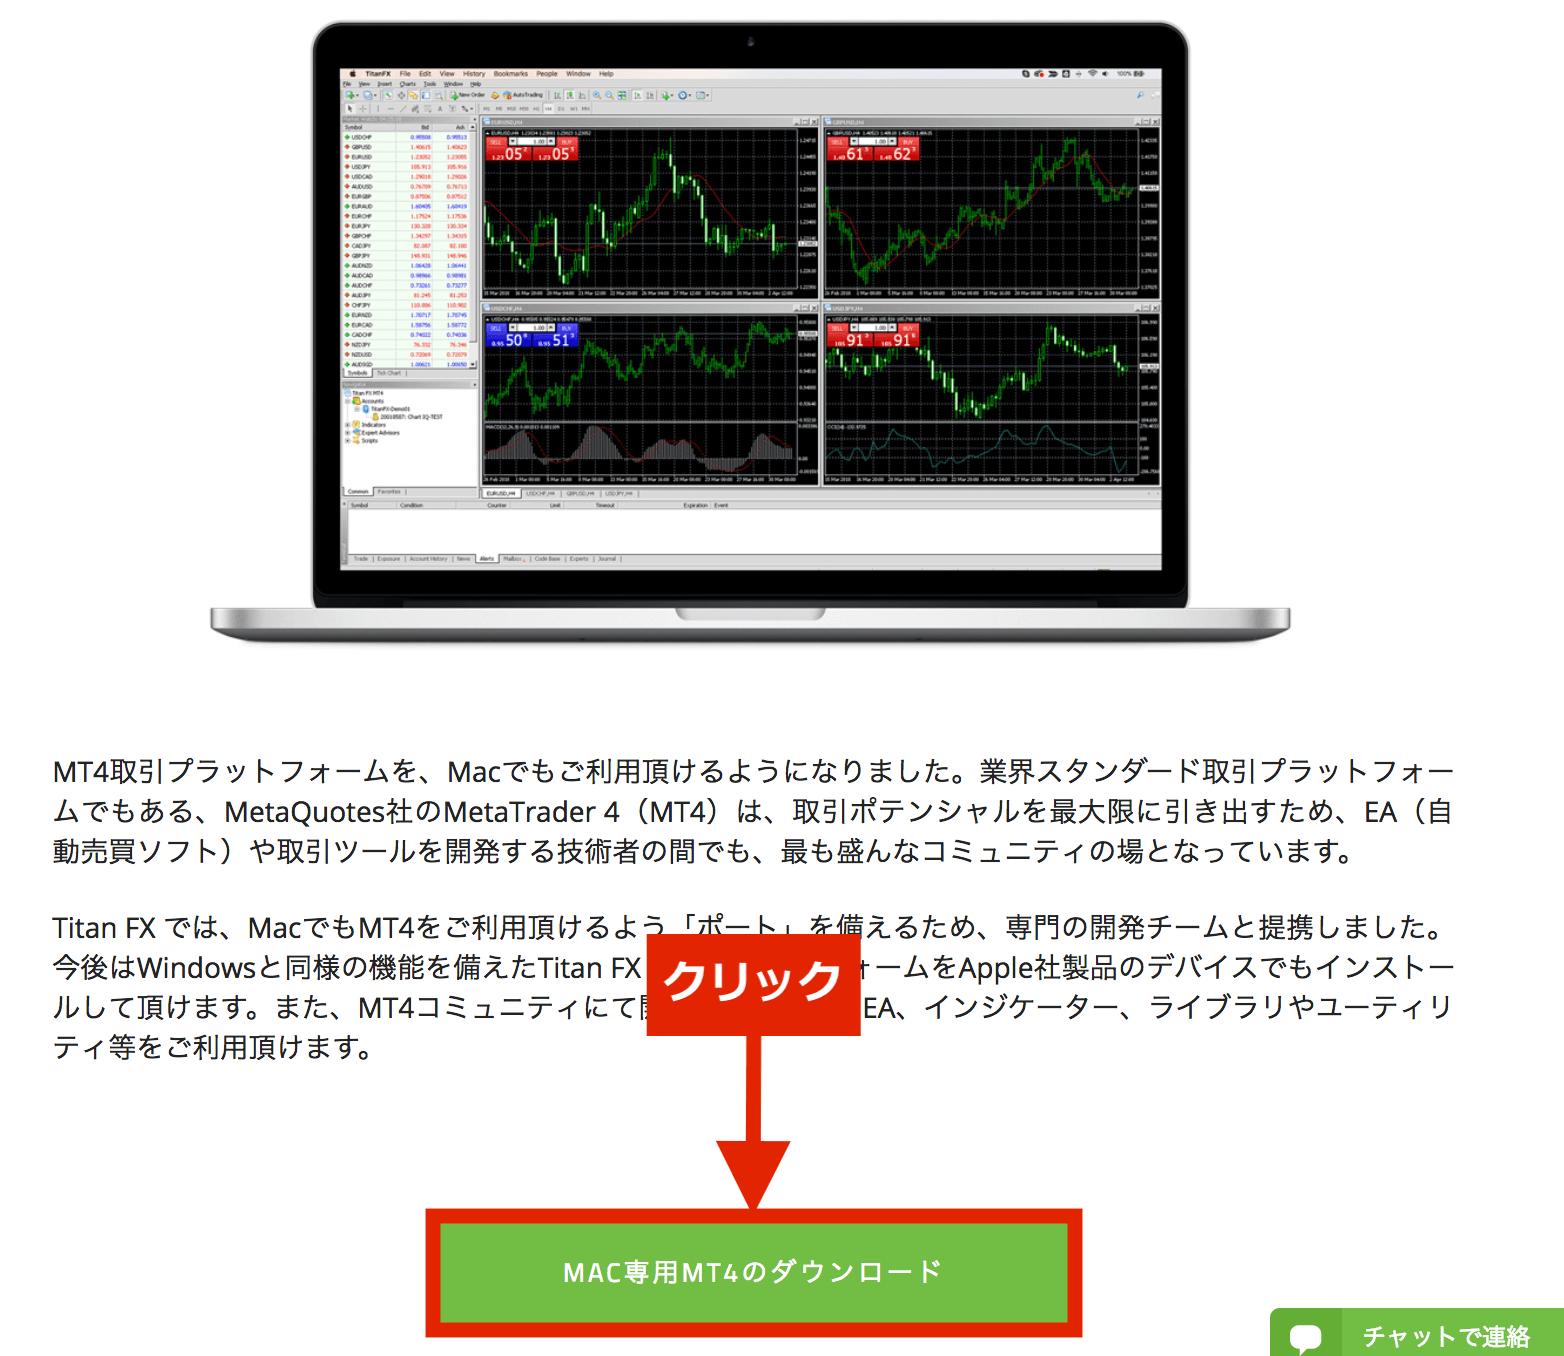 titanfx mt4 mac